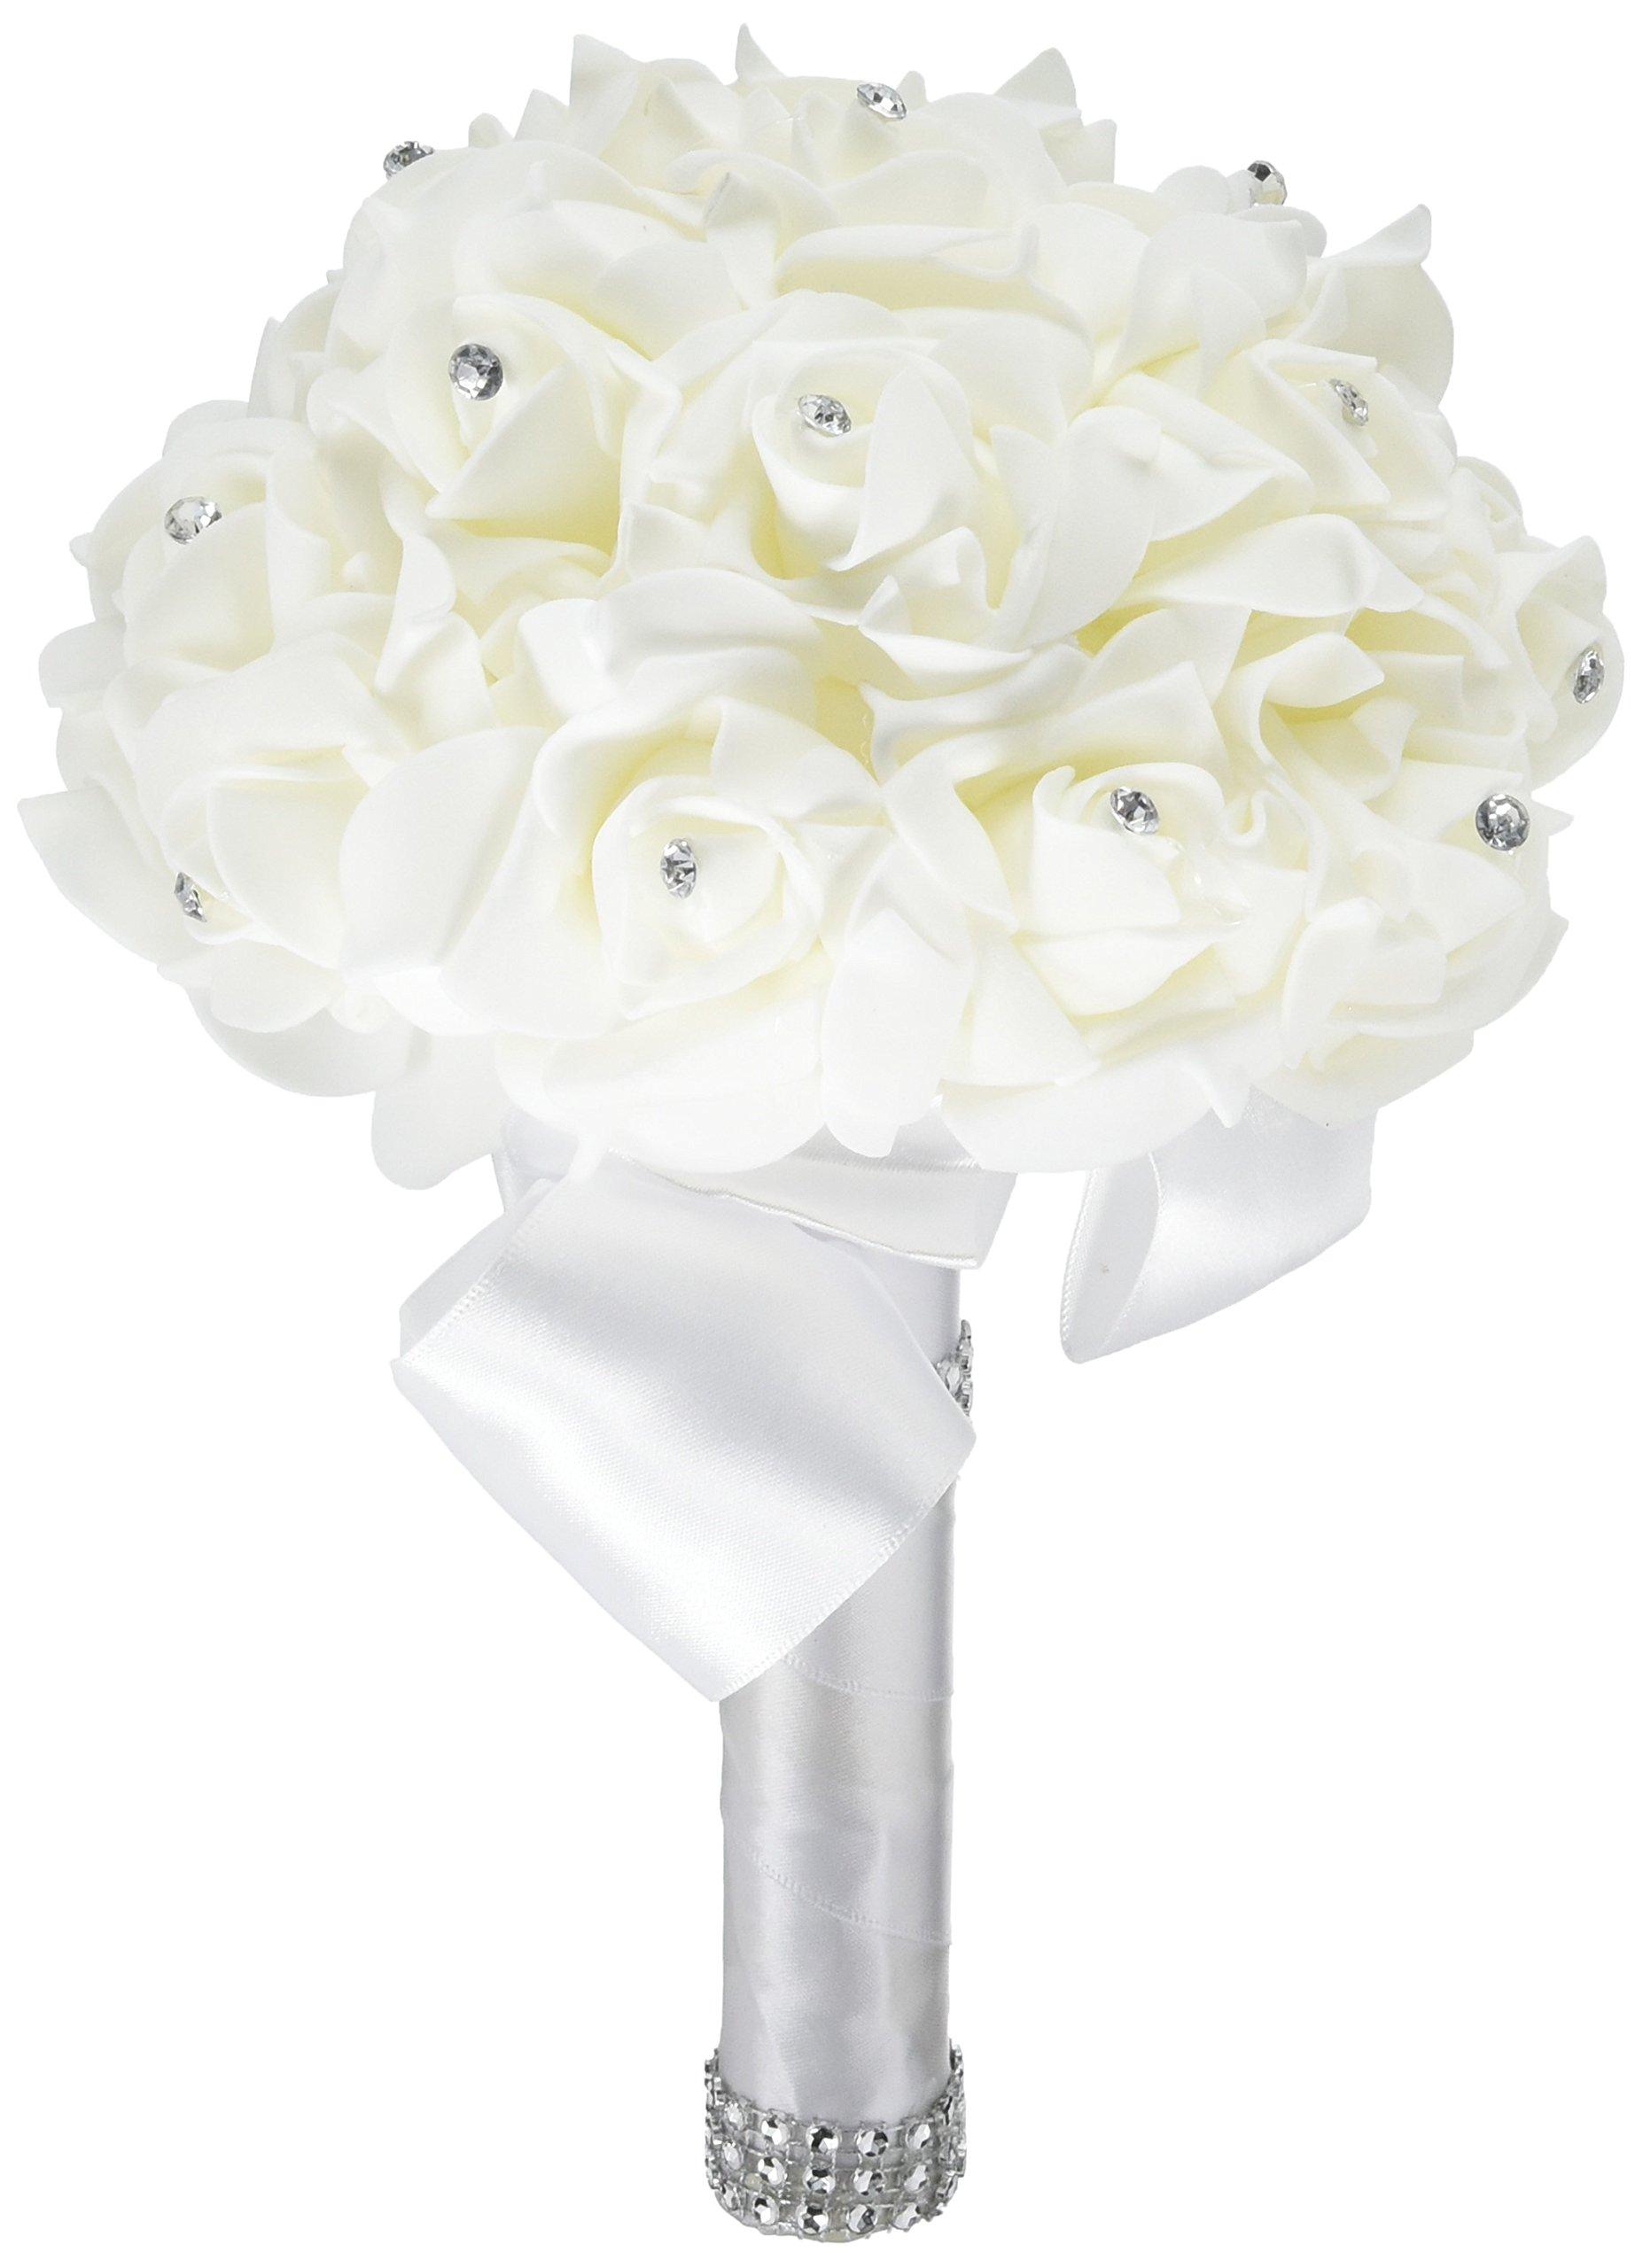 Buy wedding bouquet febou big size white bridesmaid bouquet bridal wedding bouquet febou big size white bridesmaid bouquet bridal bouquet with crystals soft ribbons izmirmasajfo